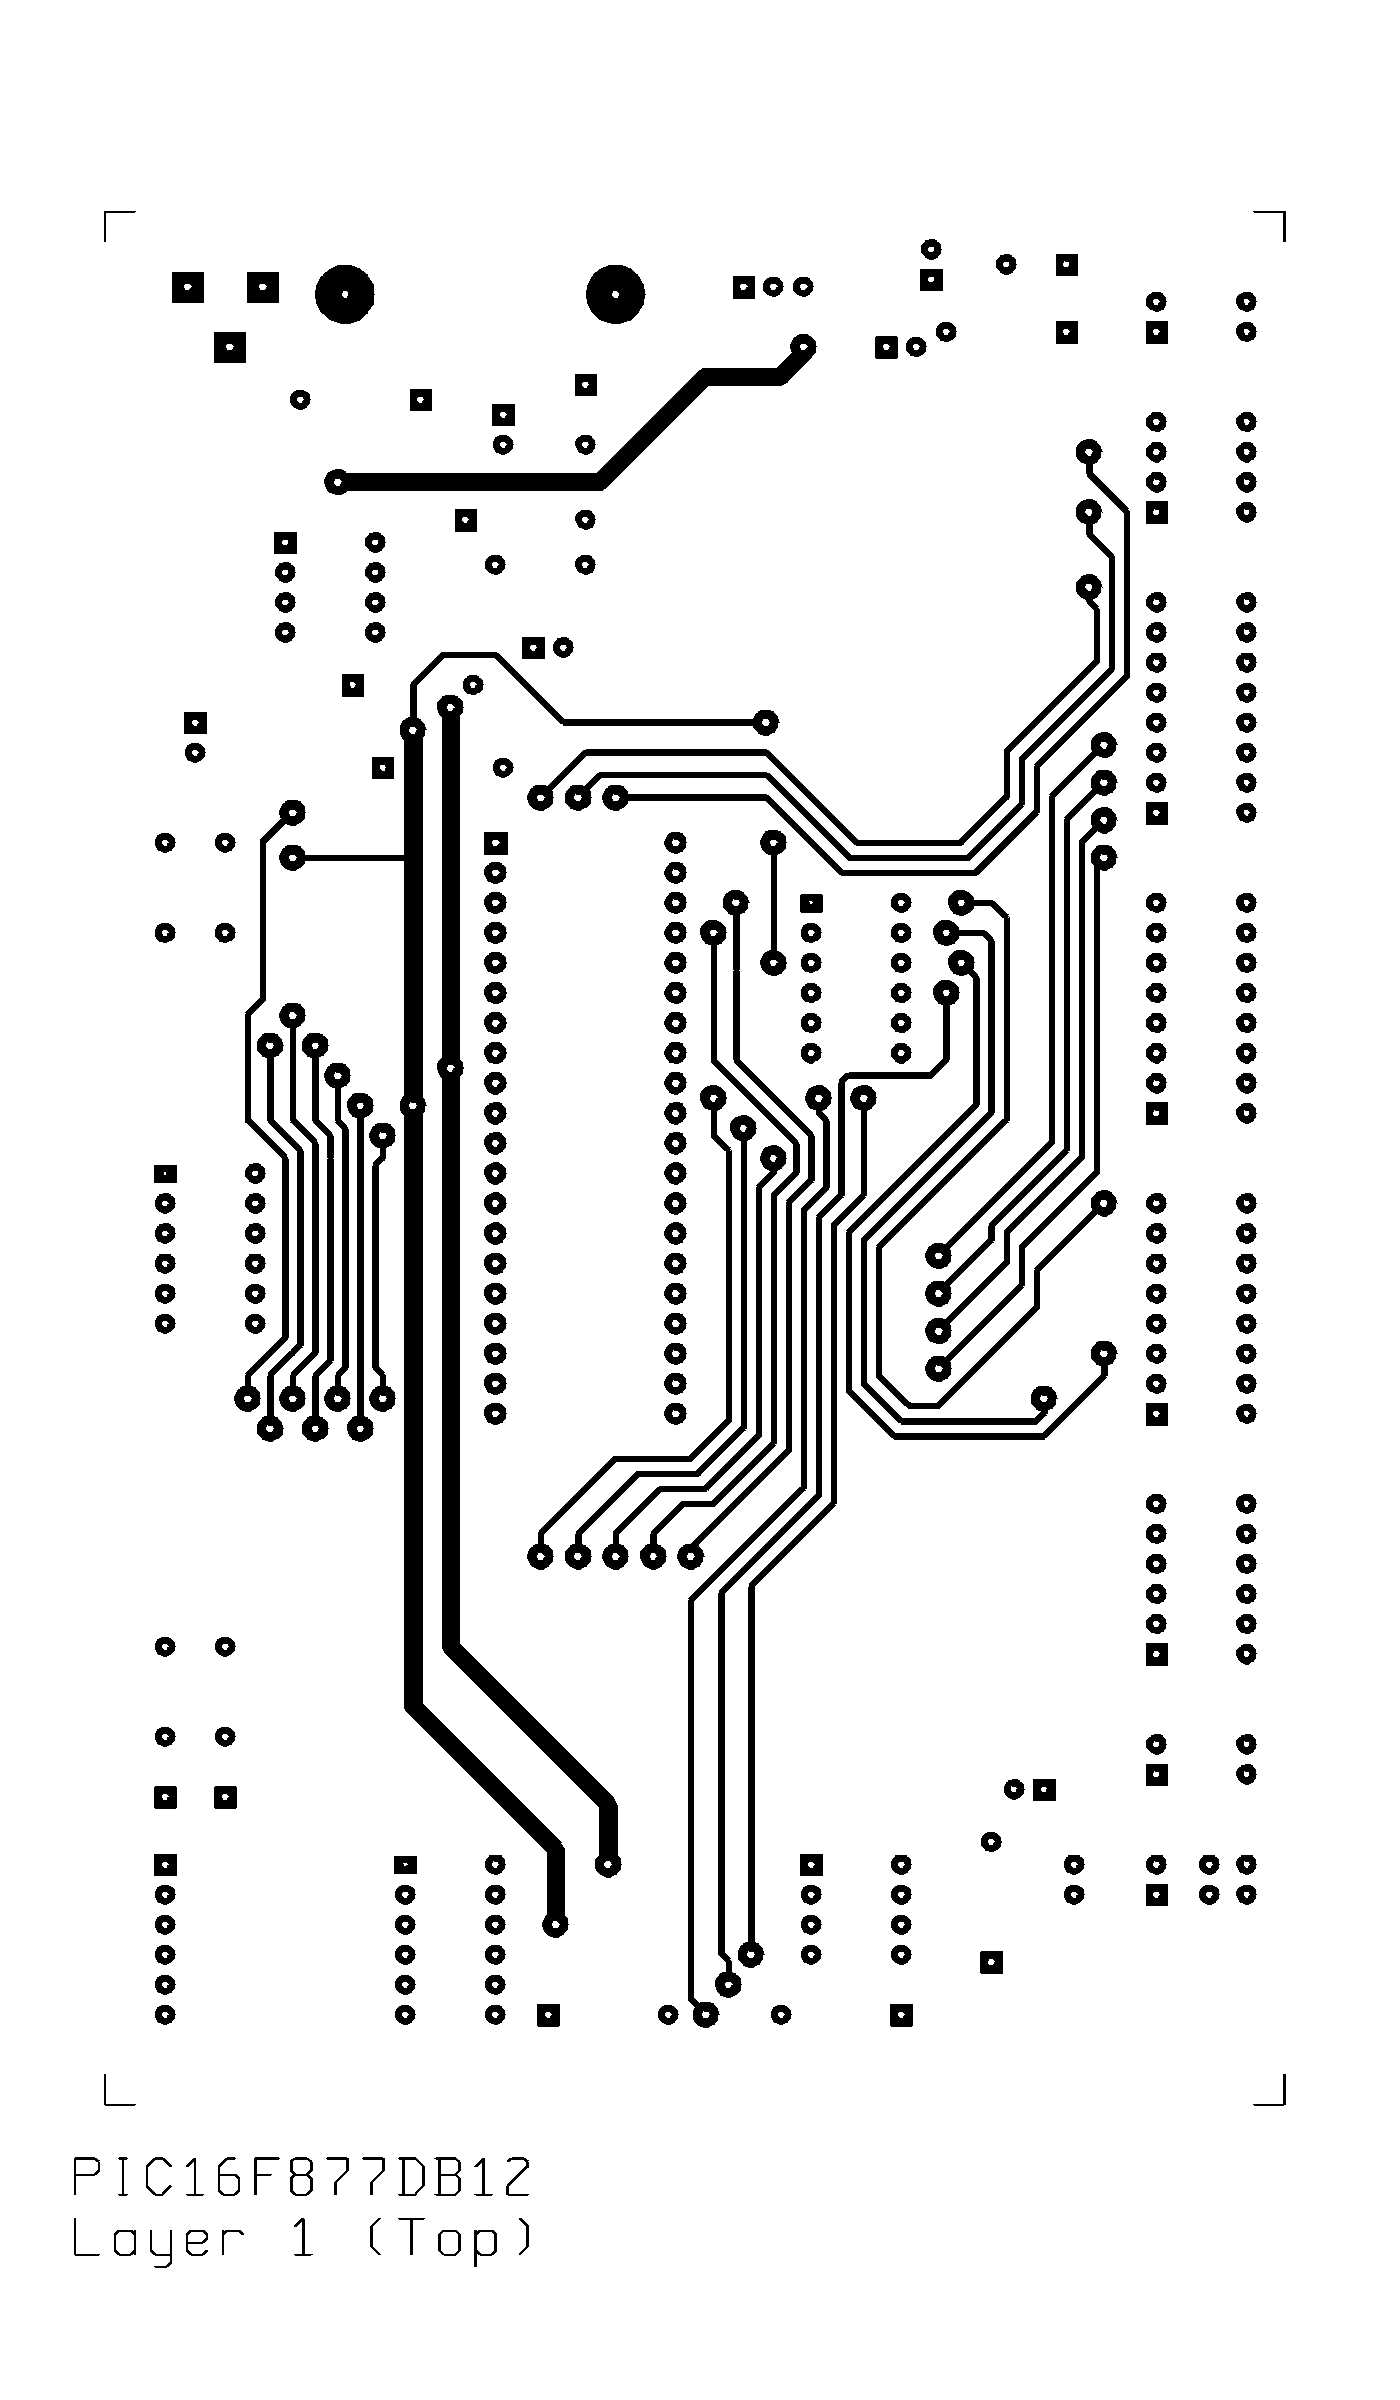 pic16f877 development board v  1 2